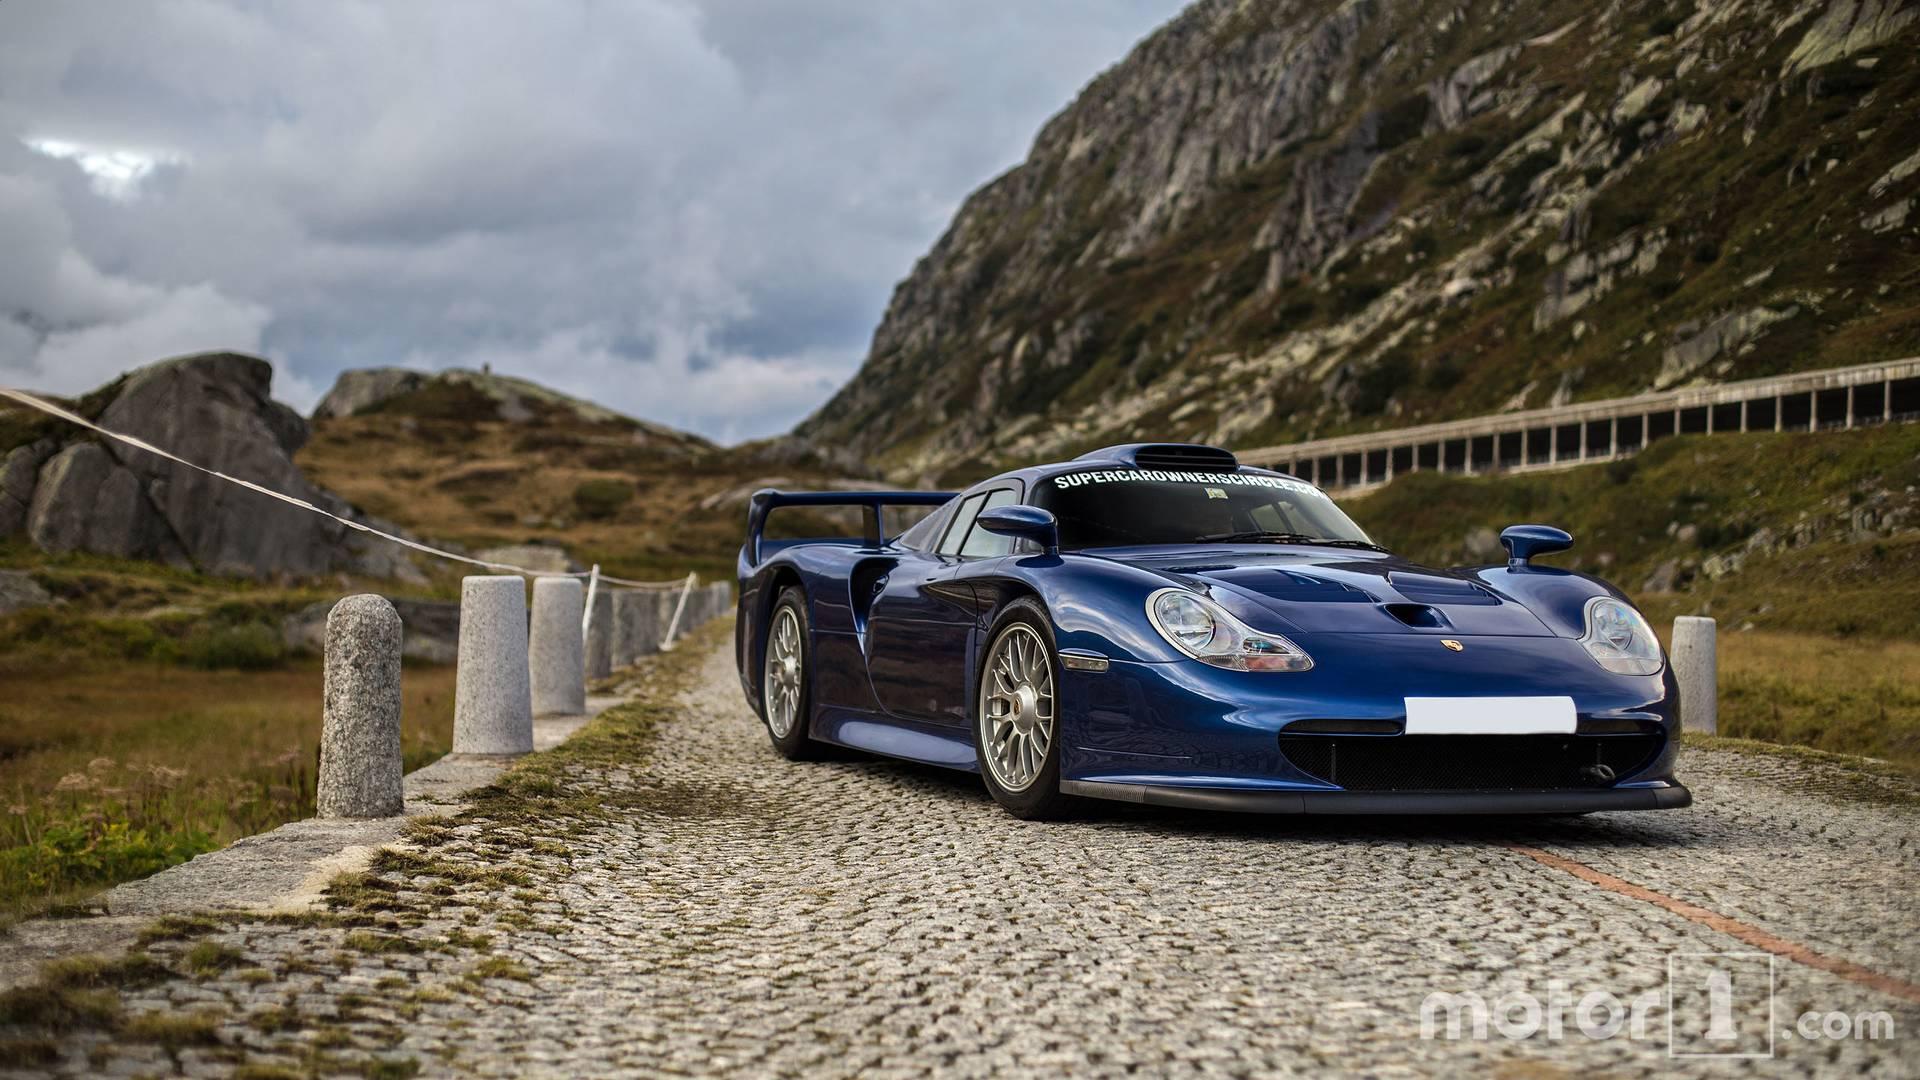 Drag Car 4k Wallpaper Porsche 911 Gt1 Poses In The Alps